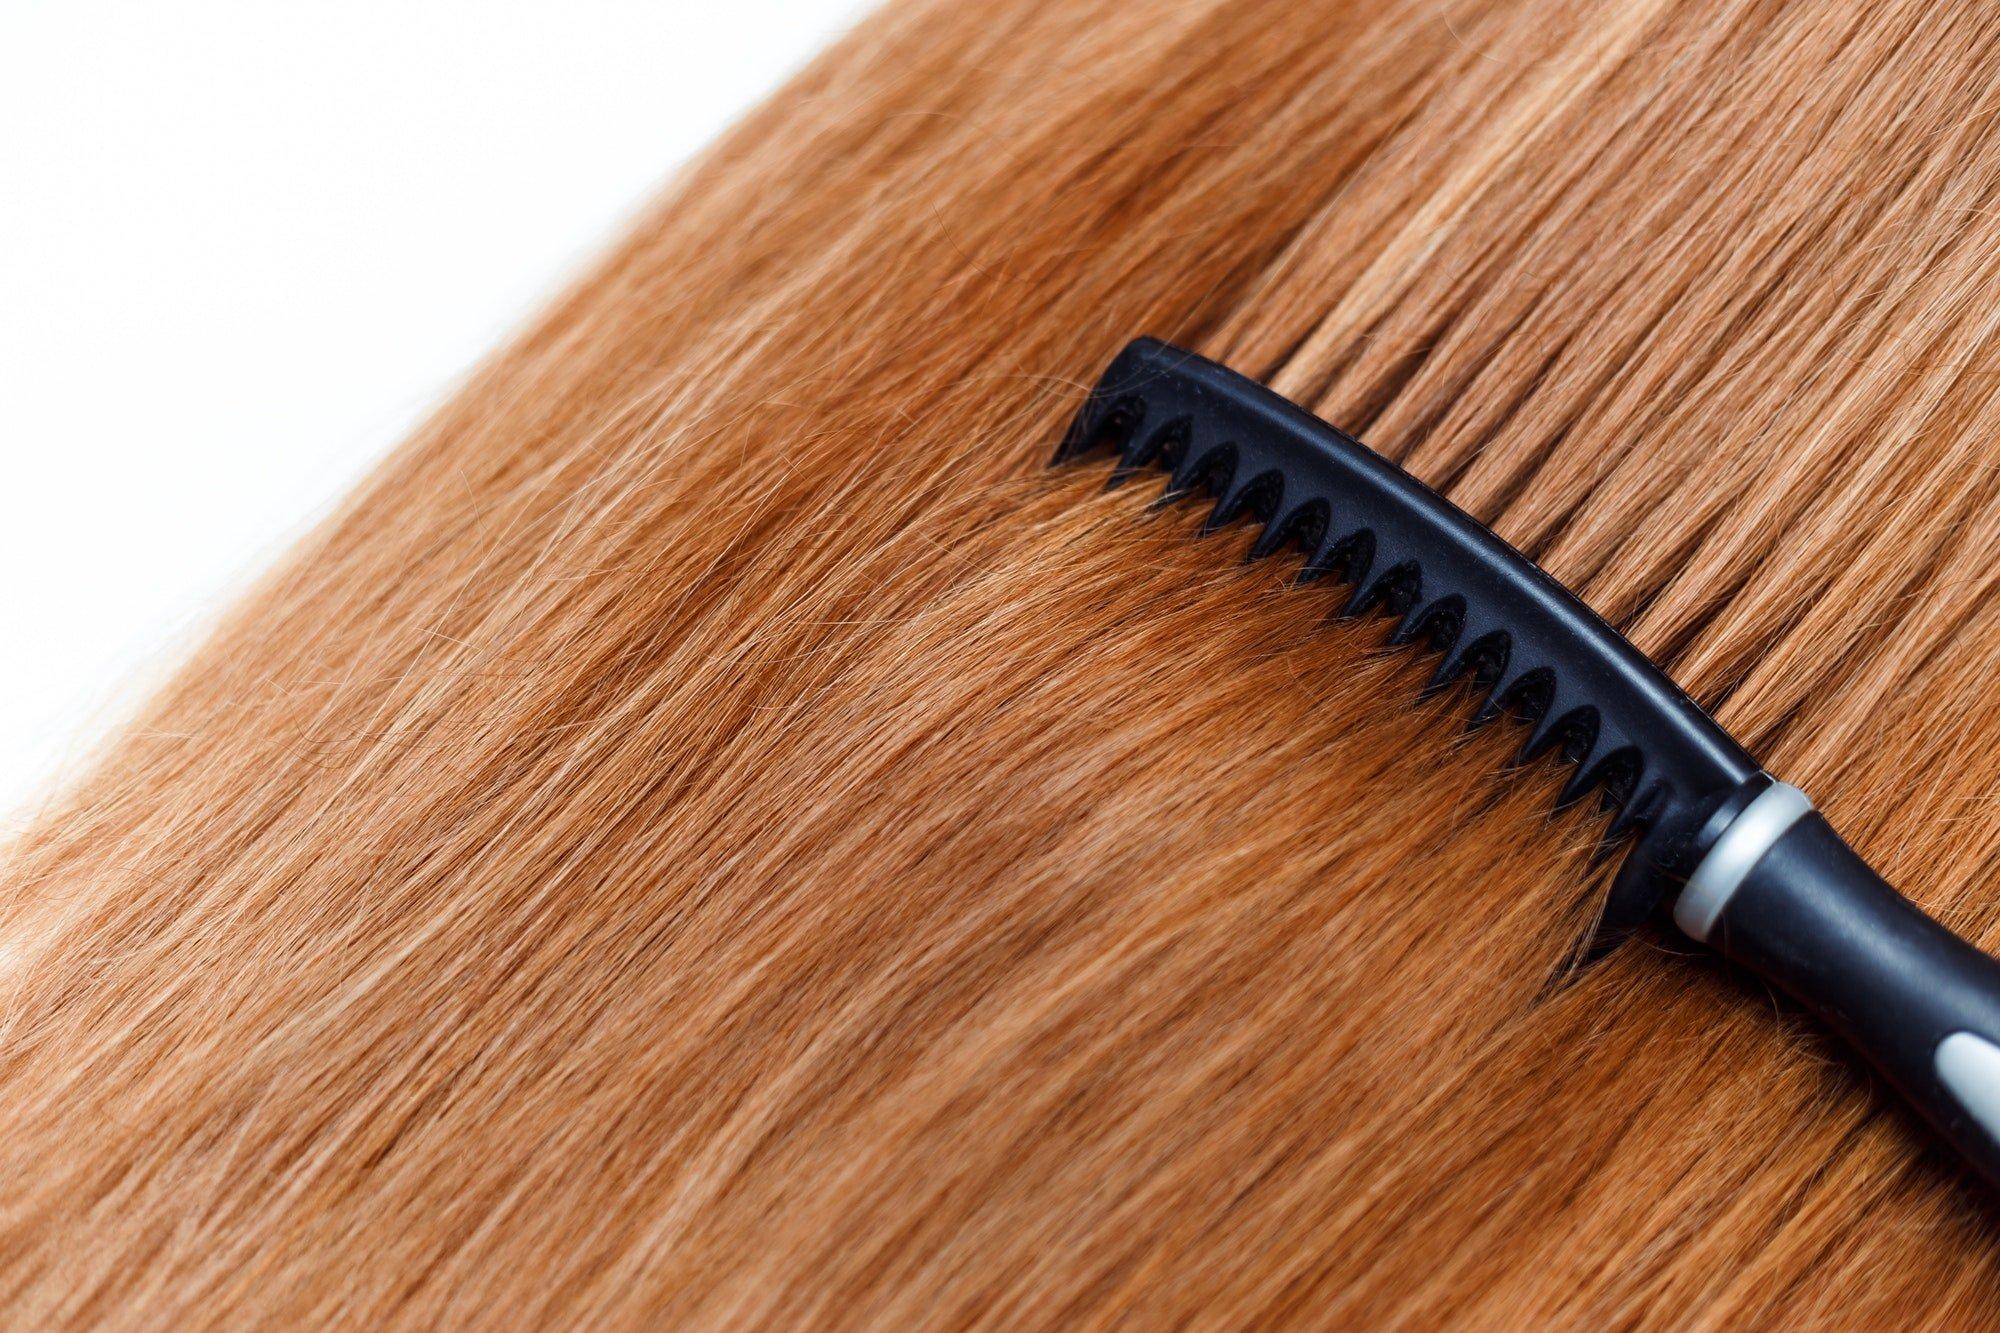 Black hairbrush comb straight red hair on white